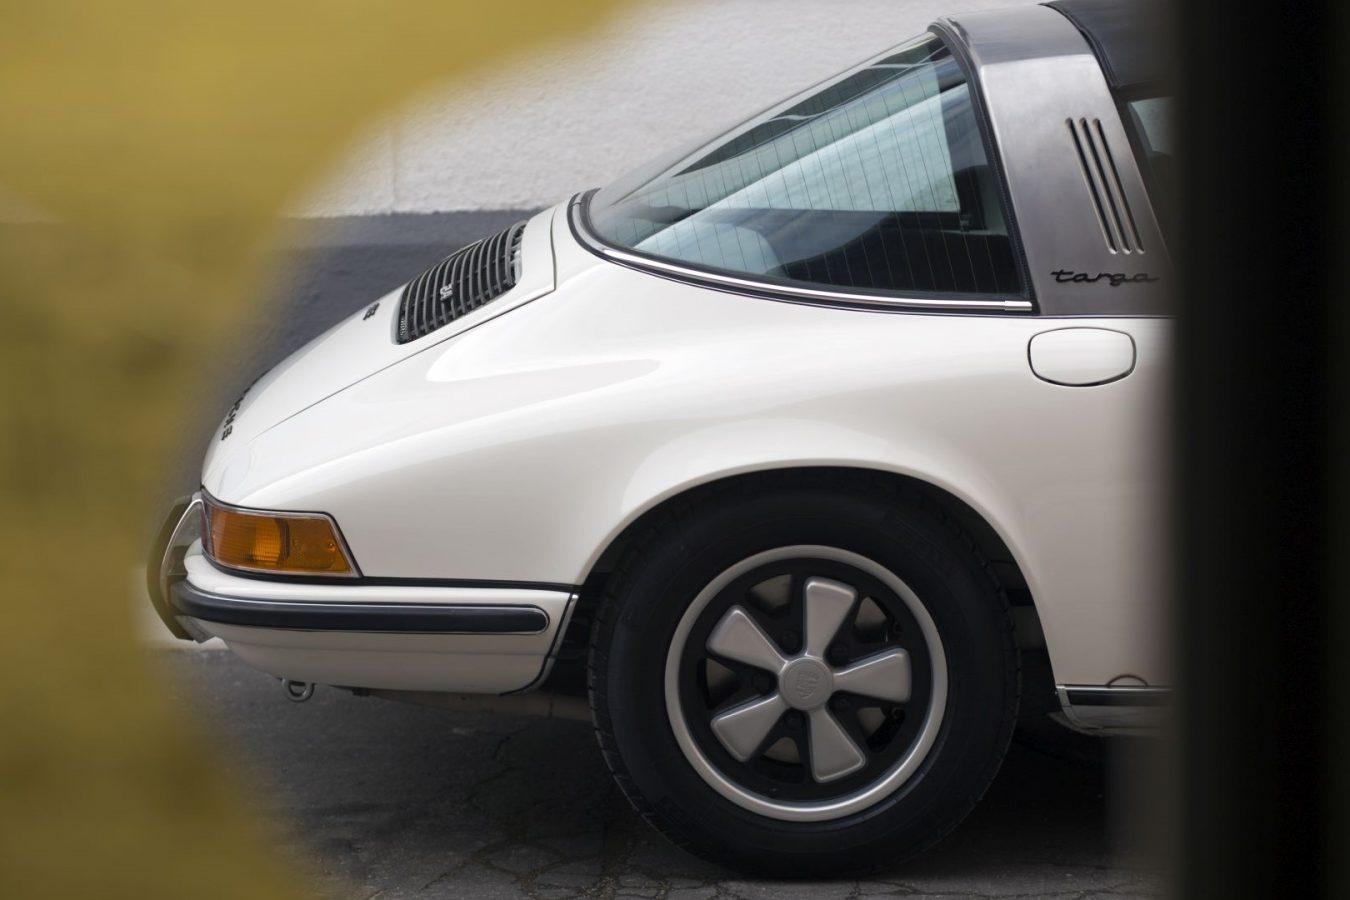 Cremeweißer Porsche 911E Targa hinten